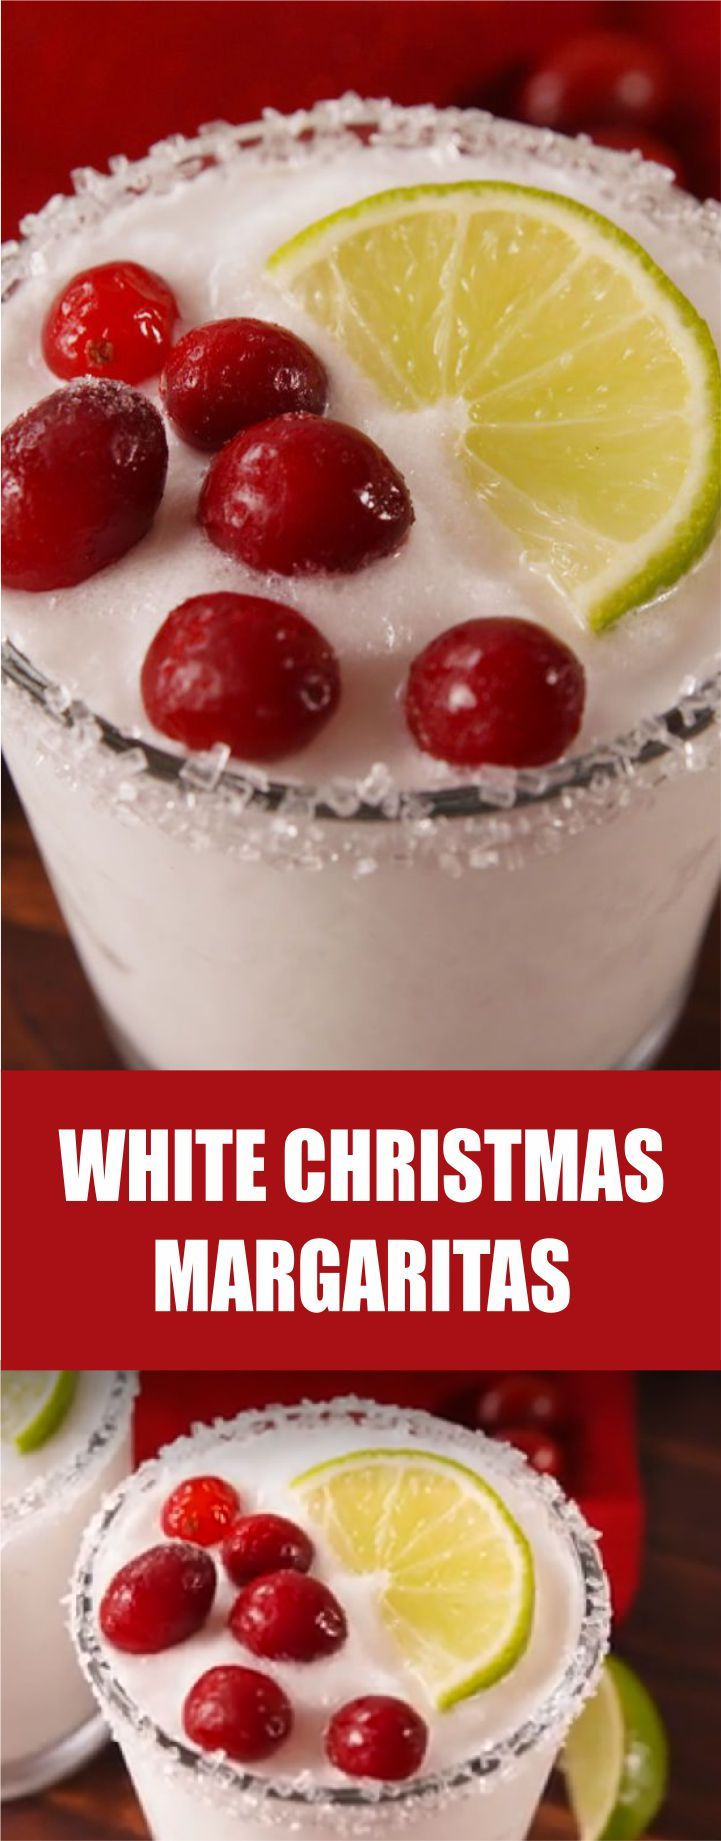 White Christmas Margaritas Recipe #christmasmargarita